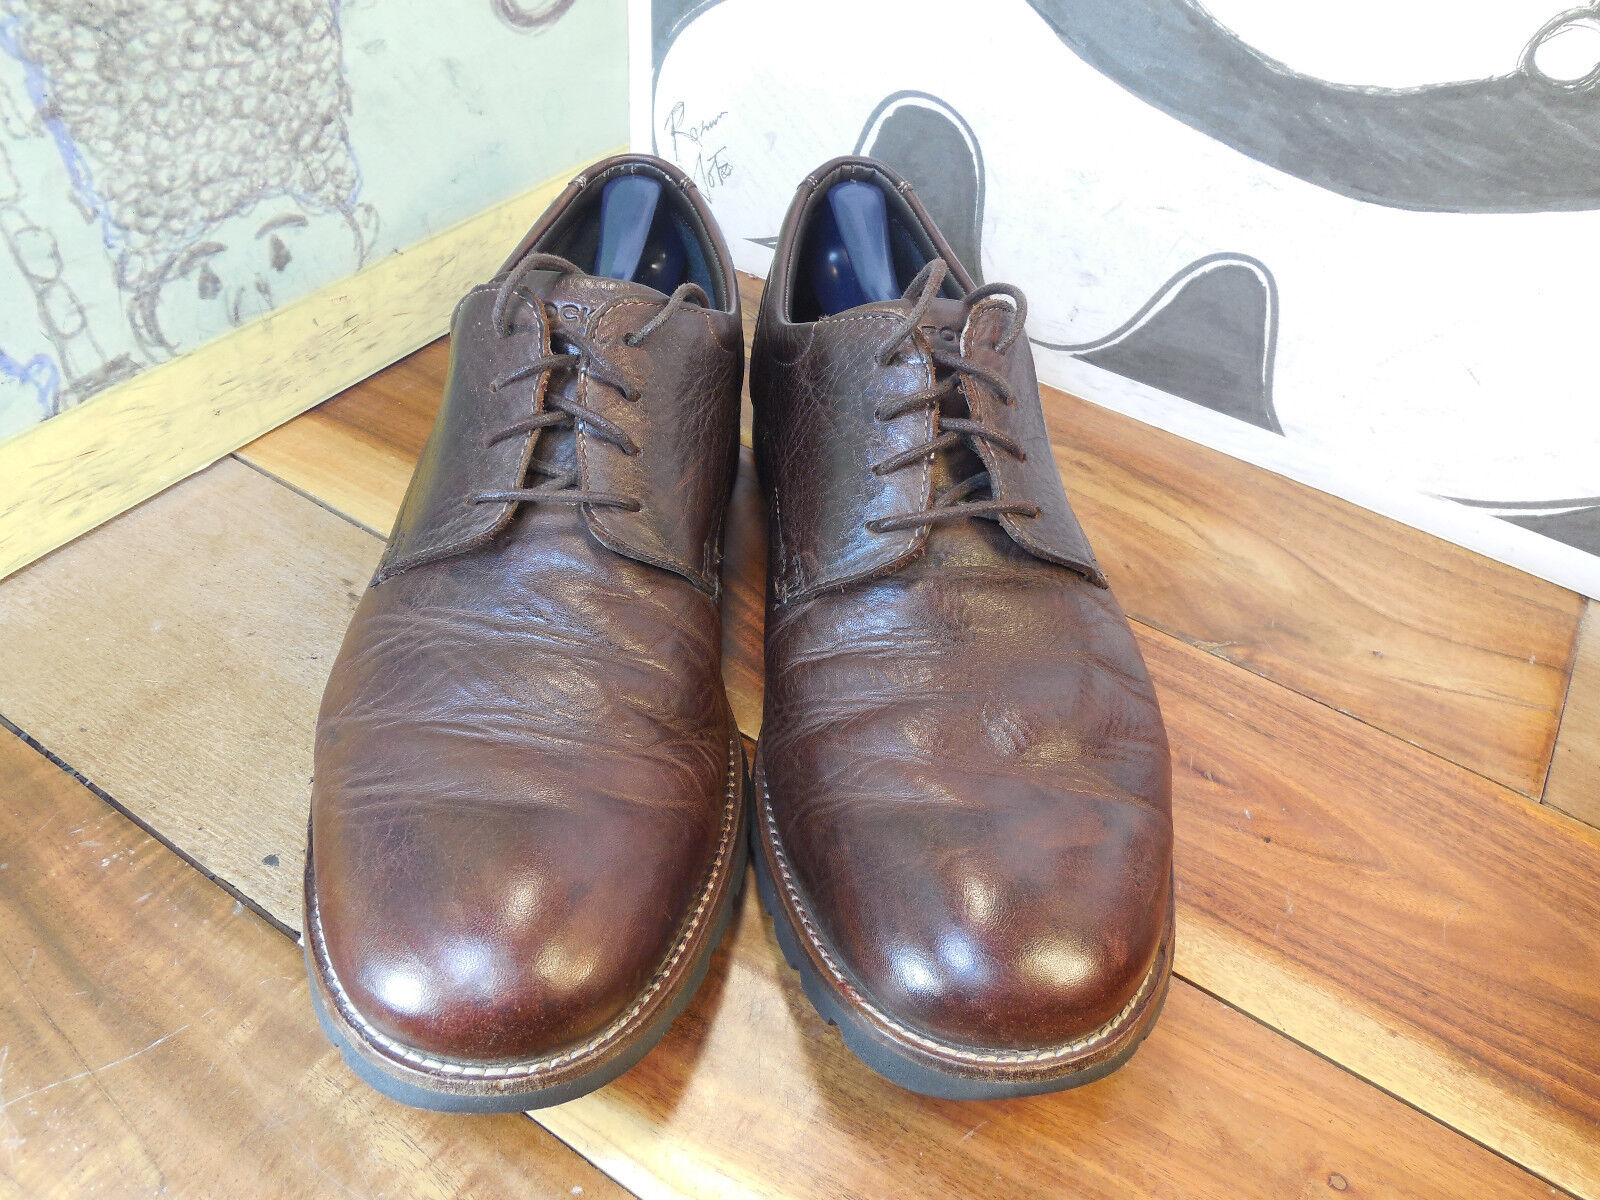 Rockport Leather Walkability Trutech Brown Leather Rockport Oxfords Men's 11.5M V74225 c83e90